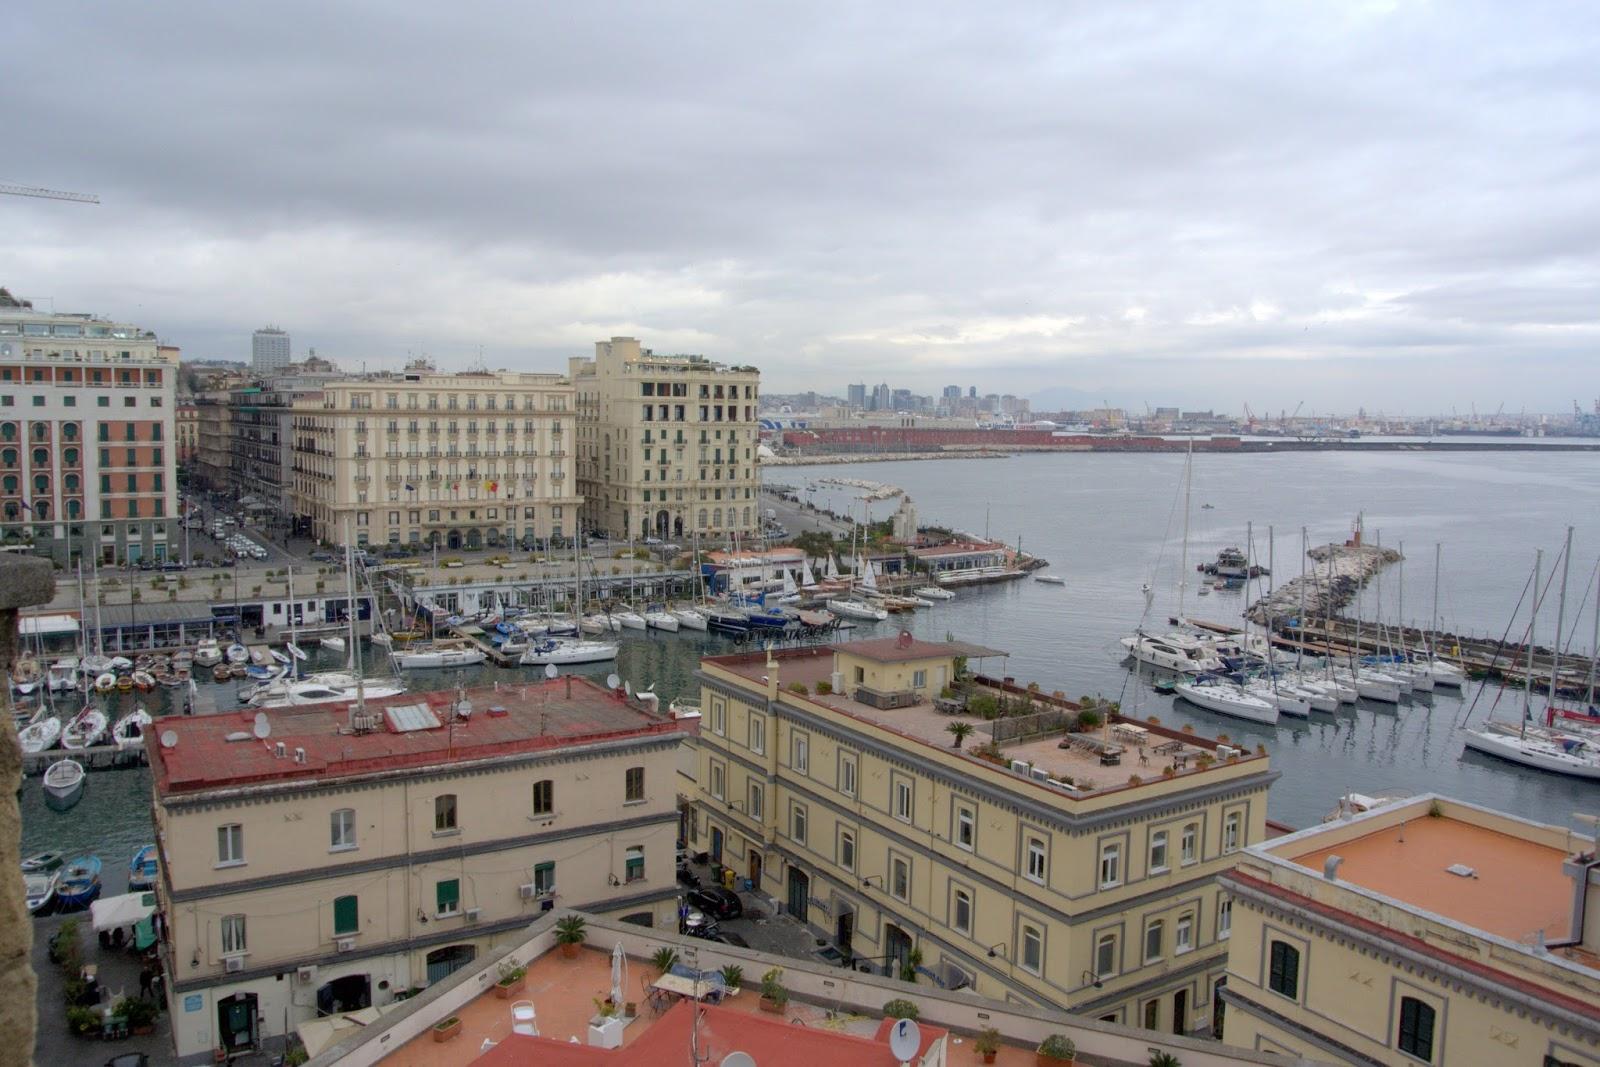 widok na miasto Neapol, punkt widokowy